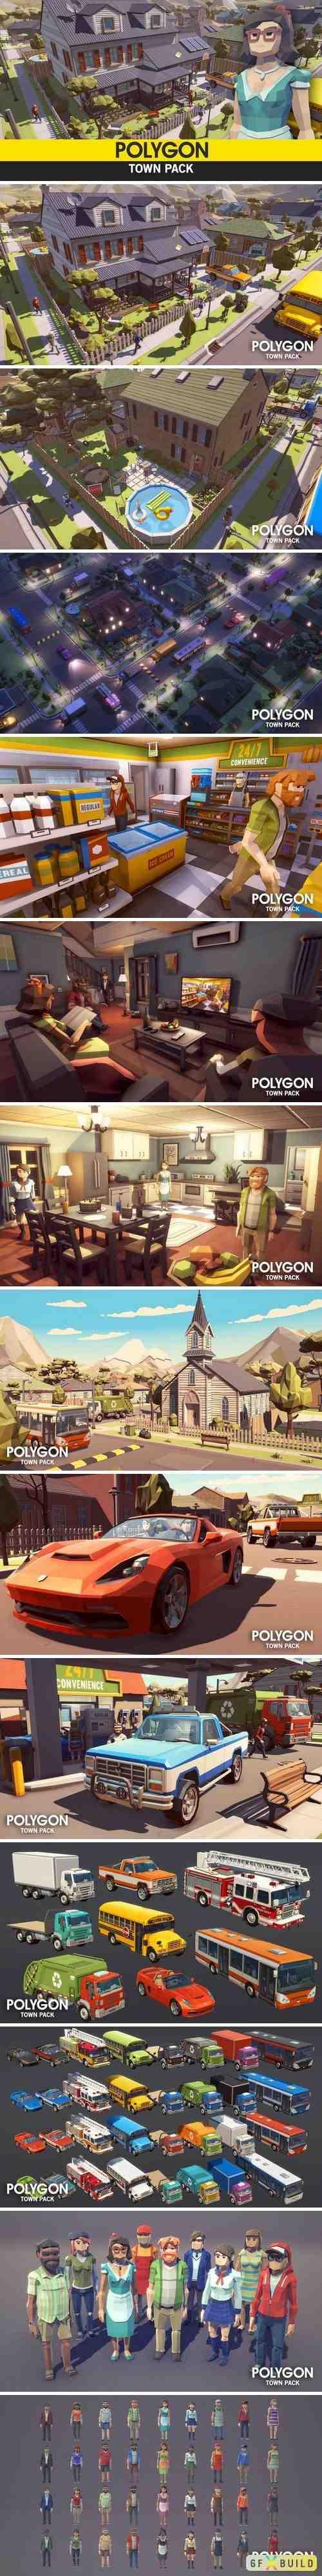 Polygon town unity